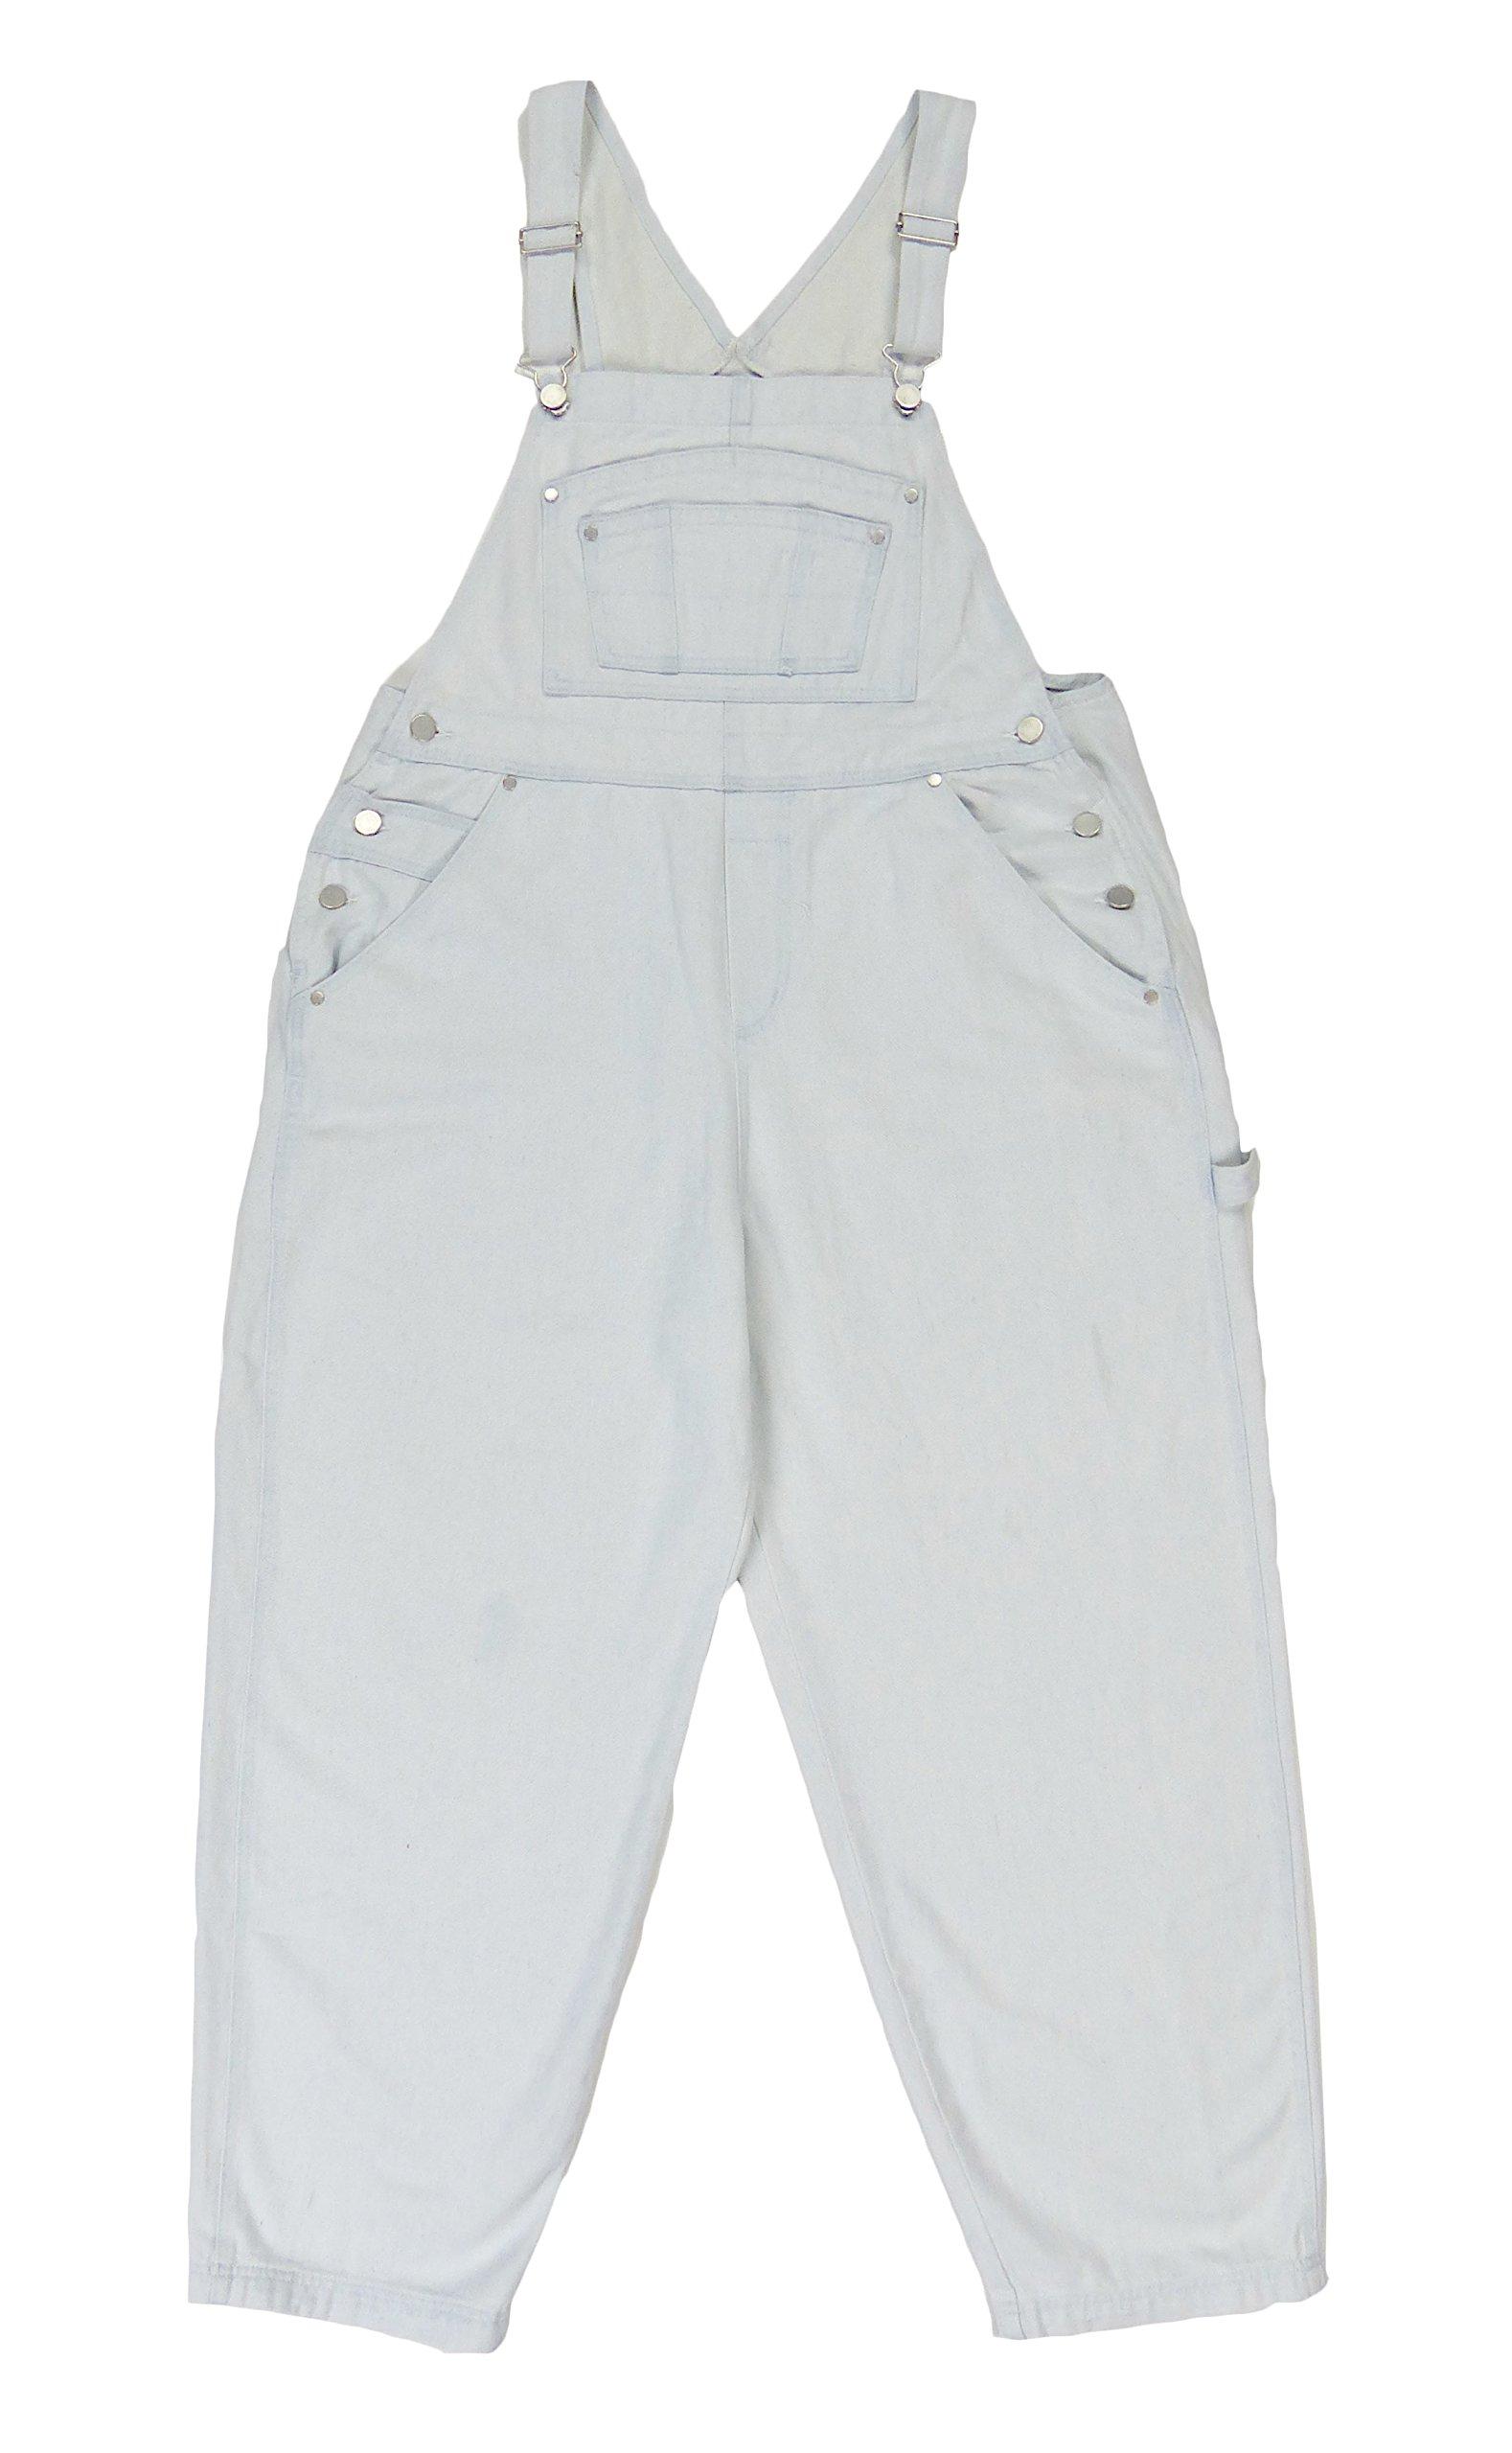 310de2ecc093 BoundOveralls Plus Size Women s Denim Bib Overalls Bleached Wash Size 16